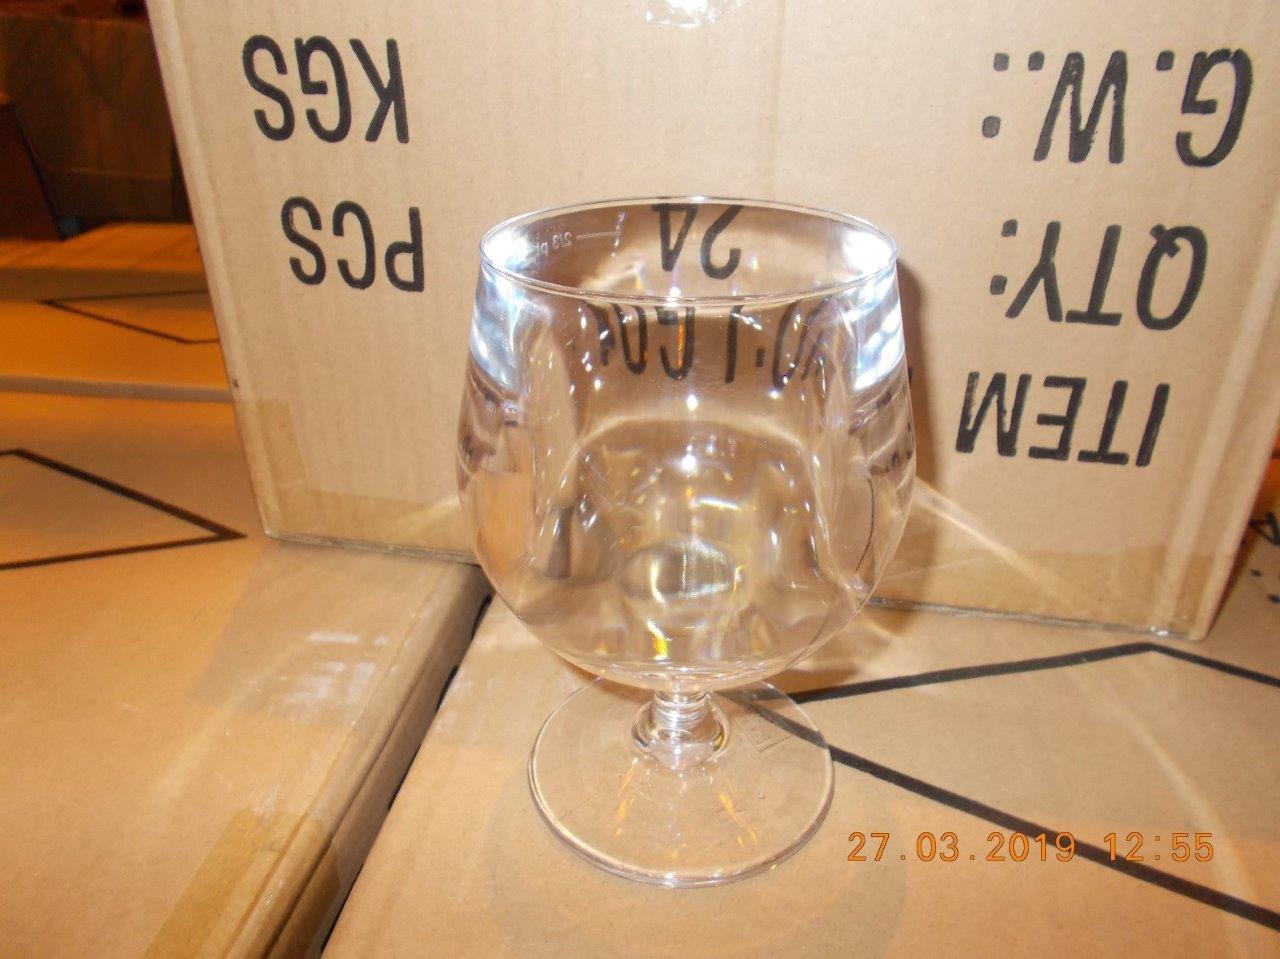 Lot 47 - Pub quality glasses and dishes